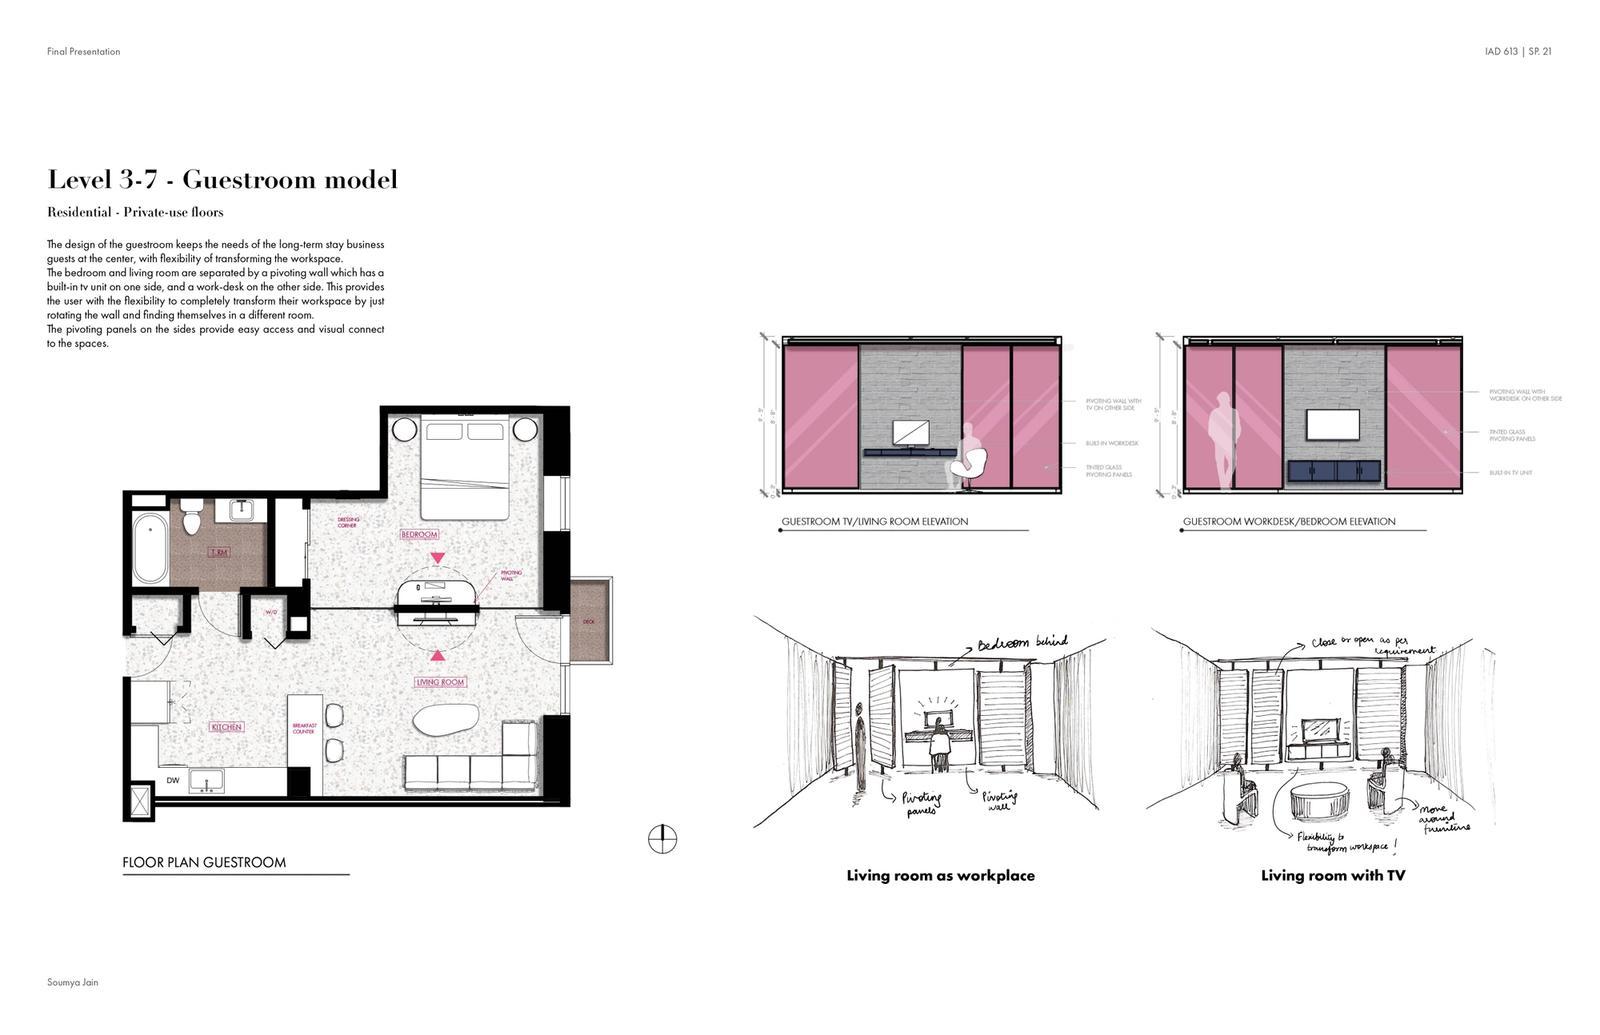 Hotel Florescence - Guestroom